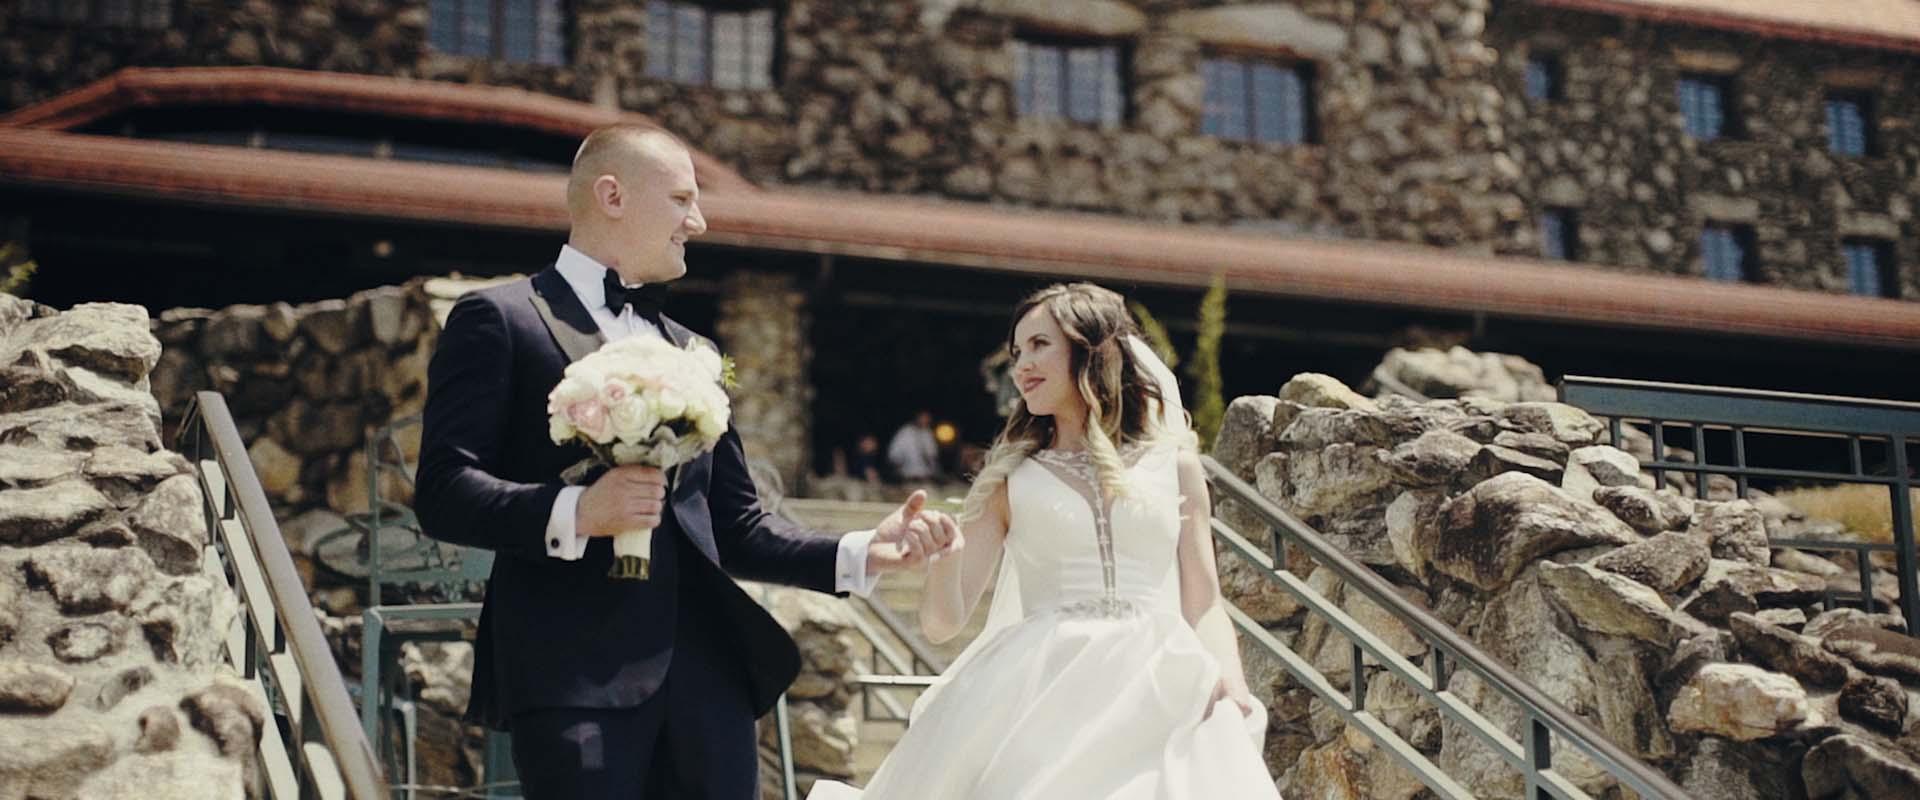 WEDDING AT THE OMNI GROVE PARK INN, ASHEVILLE NC